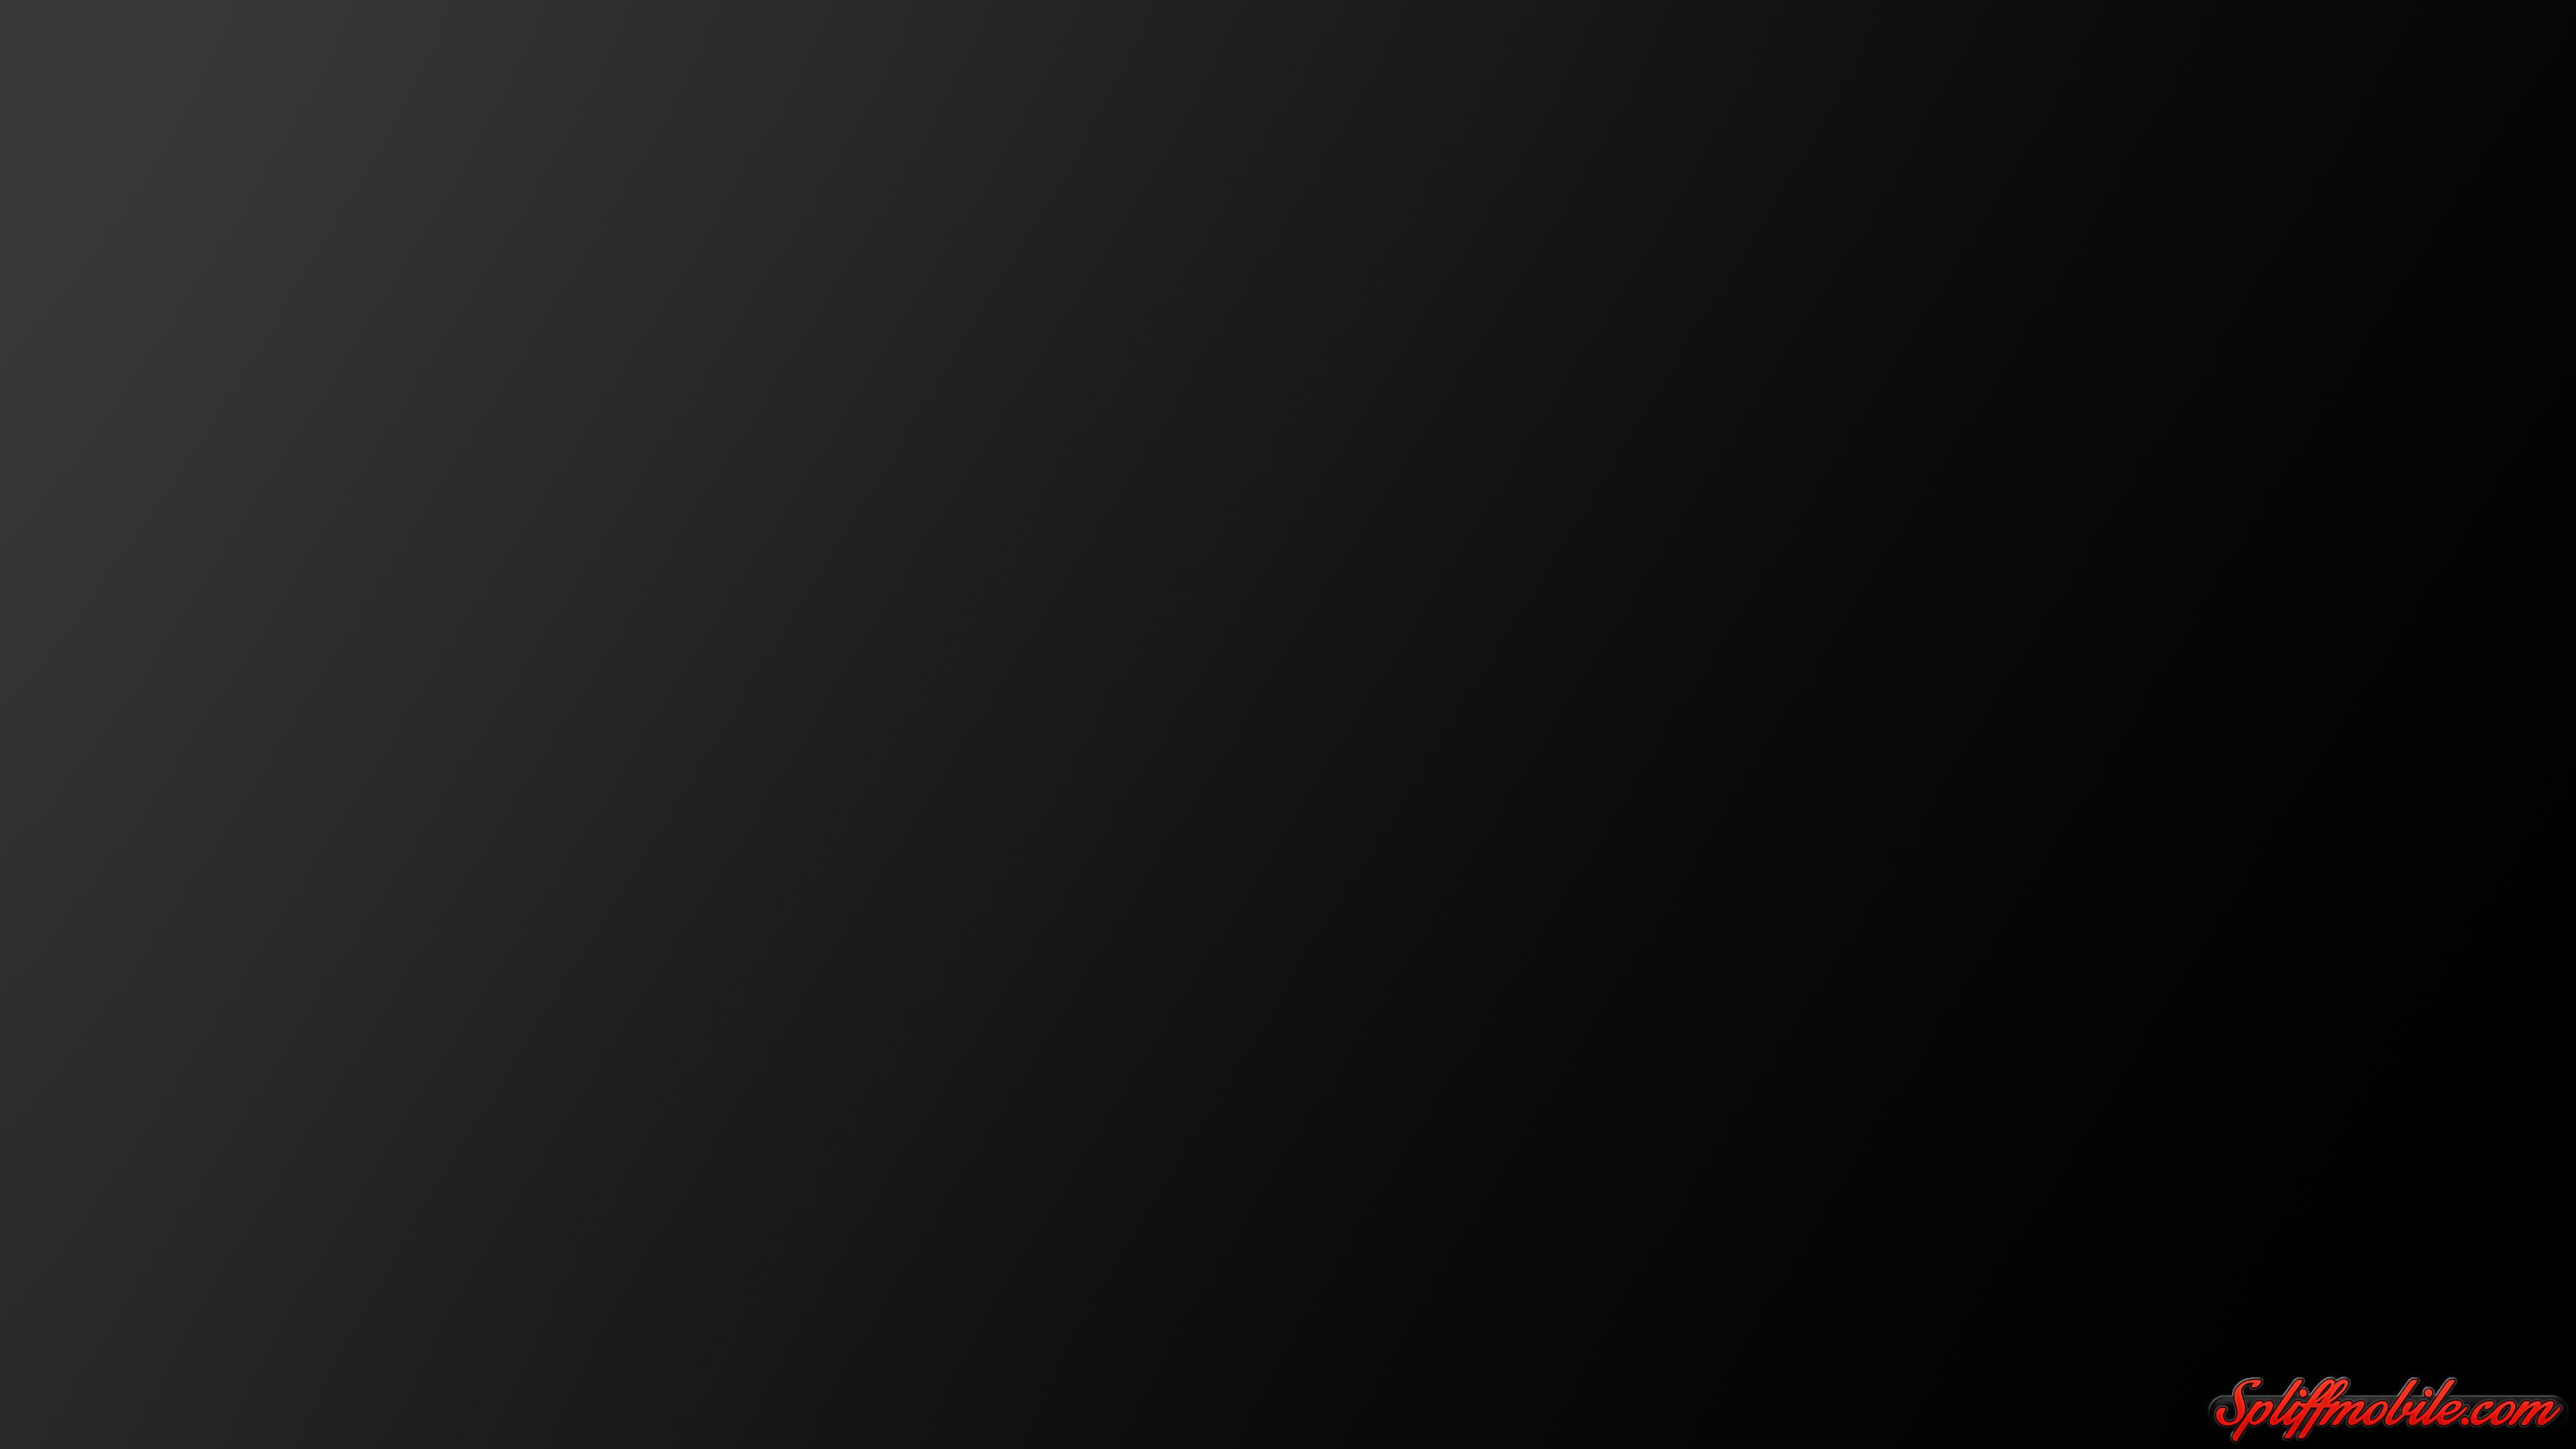 900+ Wallpaper Black Matte  Gratis